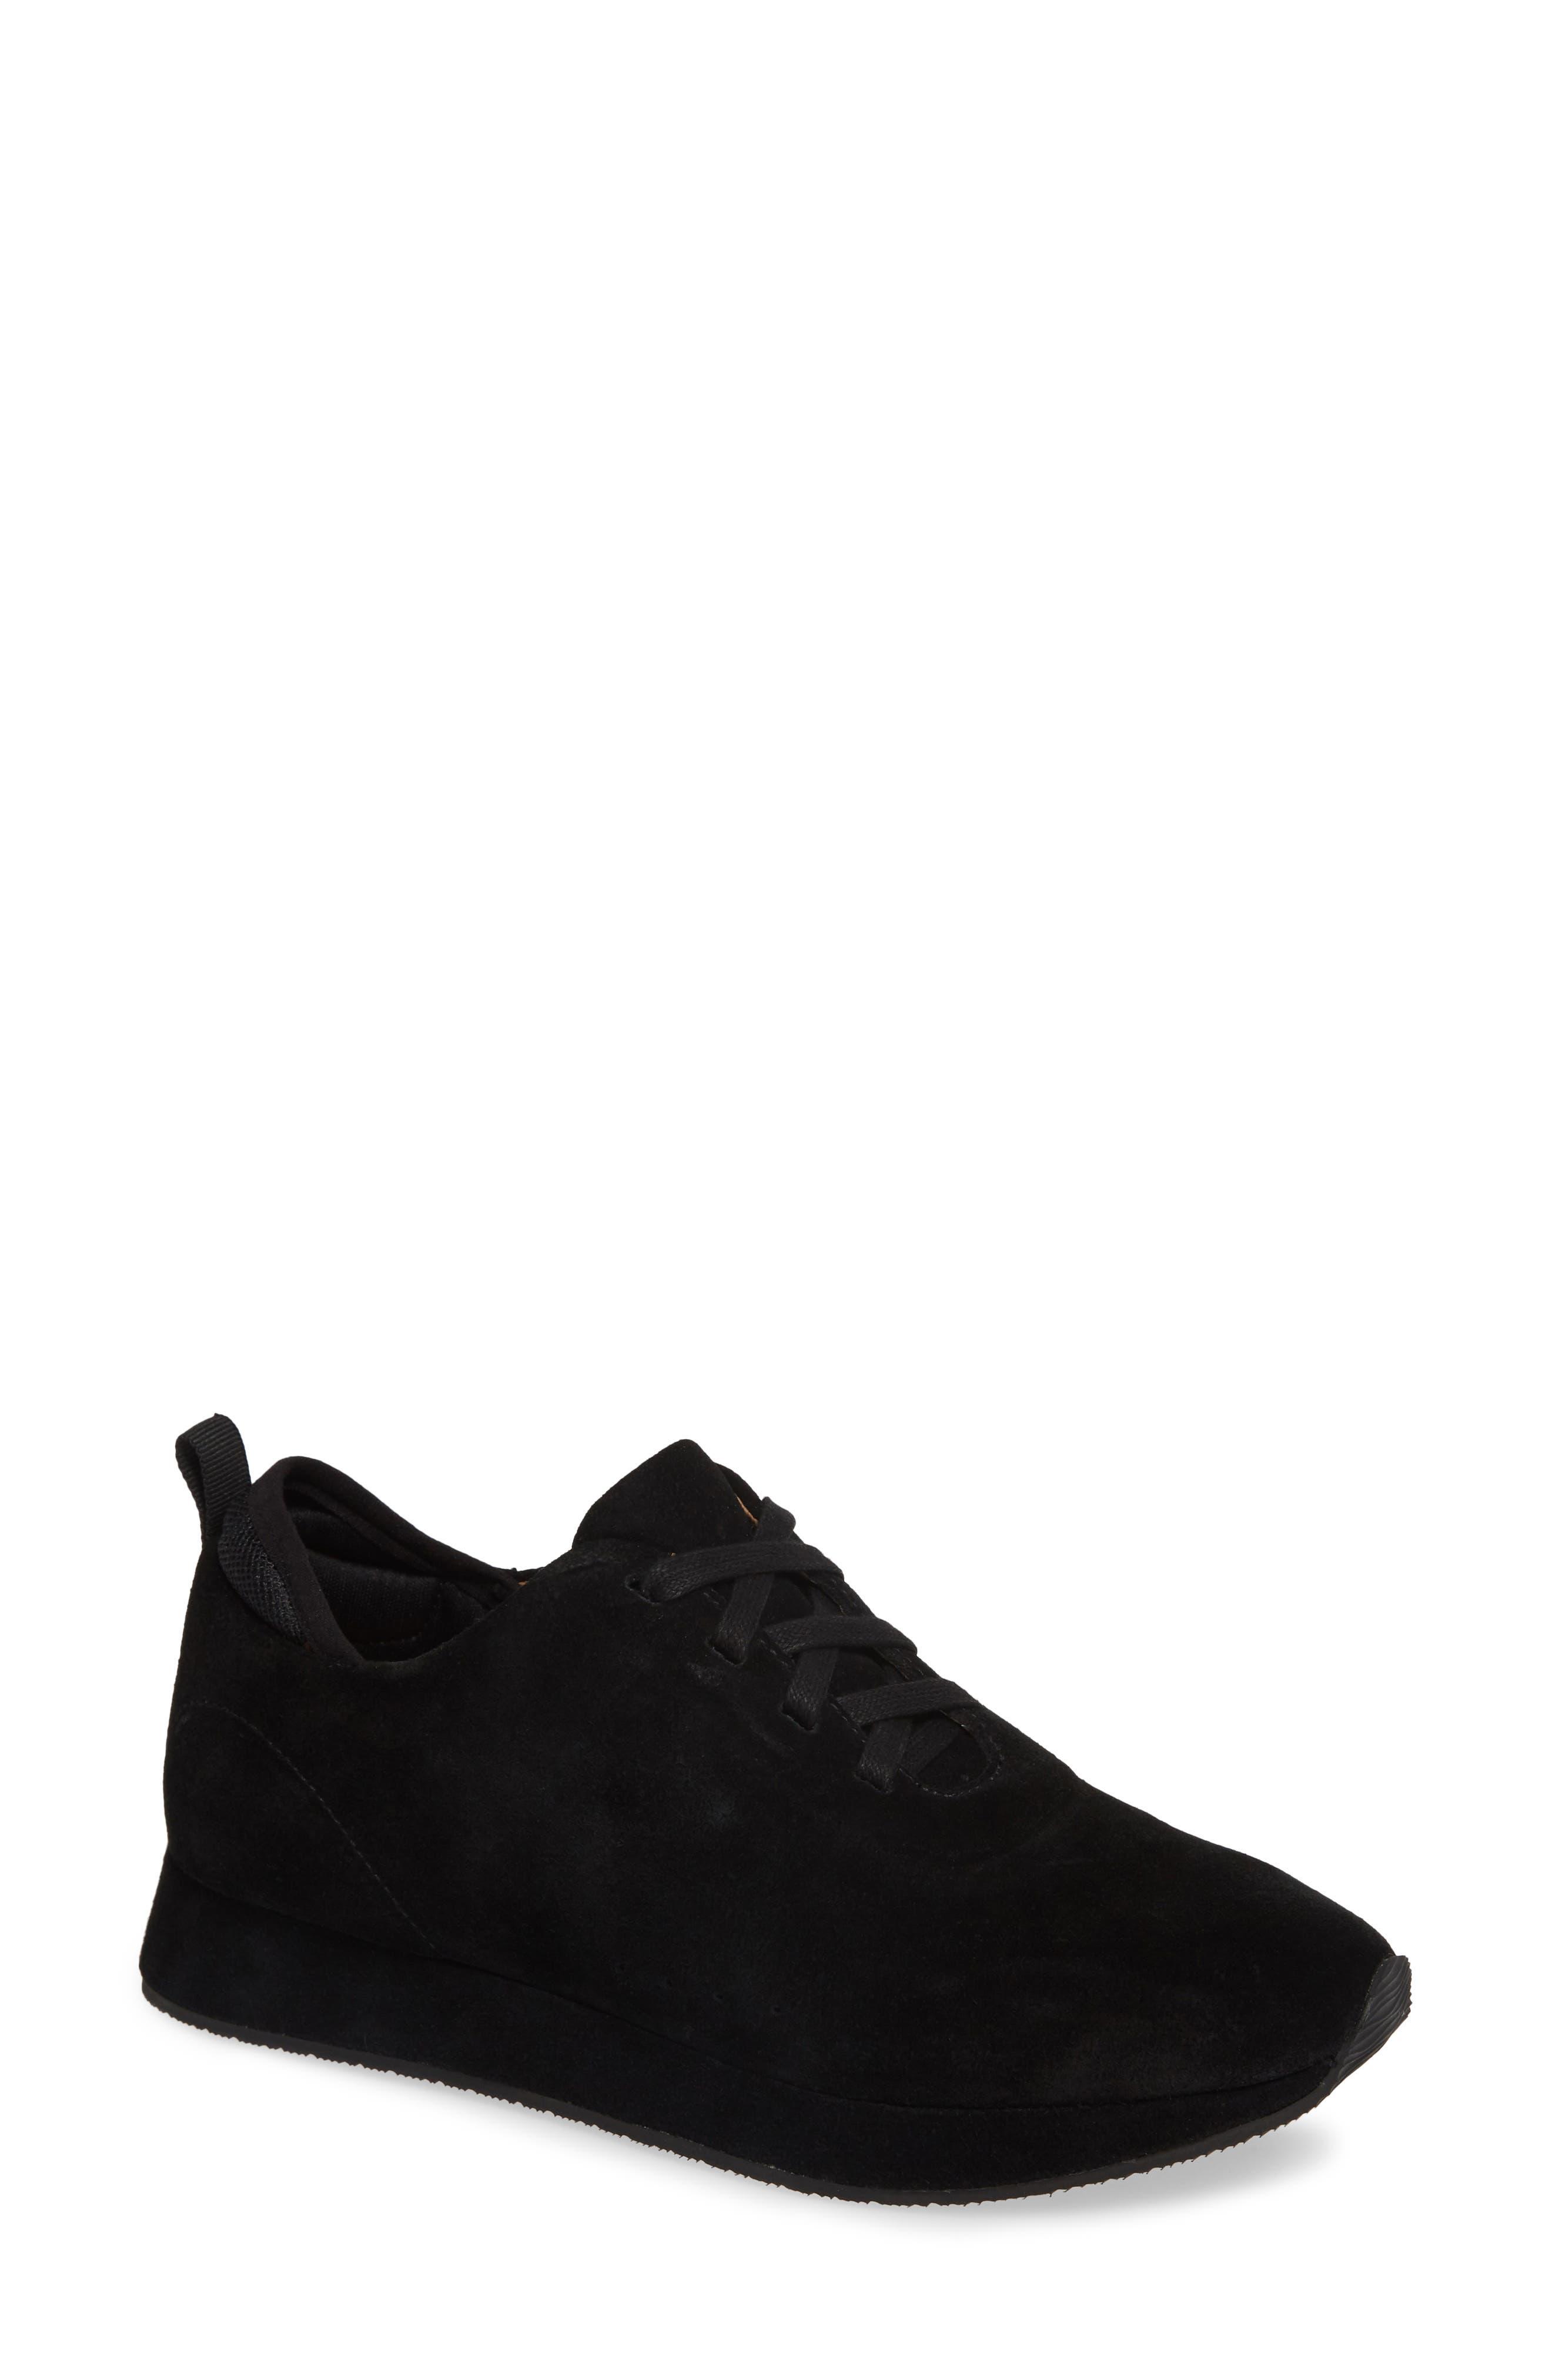 Mabel Sneaker,                             Main thumbnail 1, color,                             BLACK SUEDE